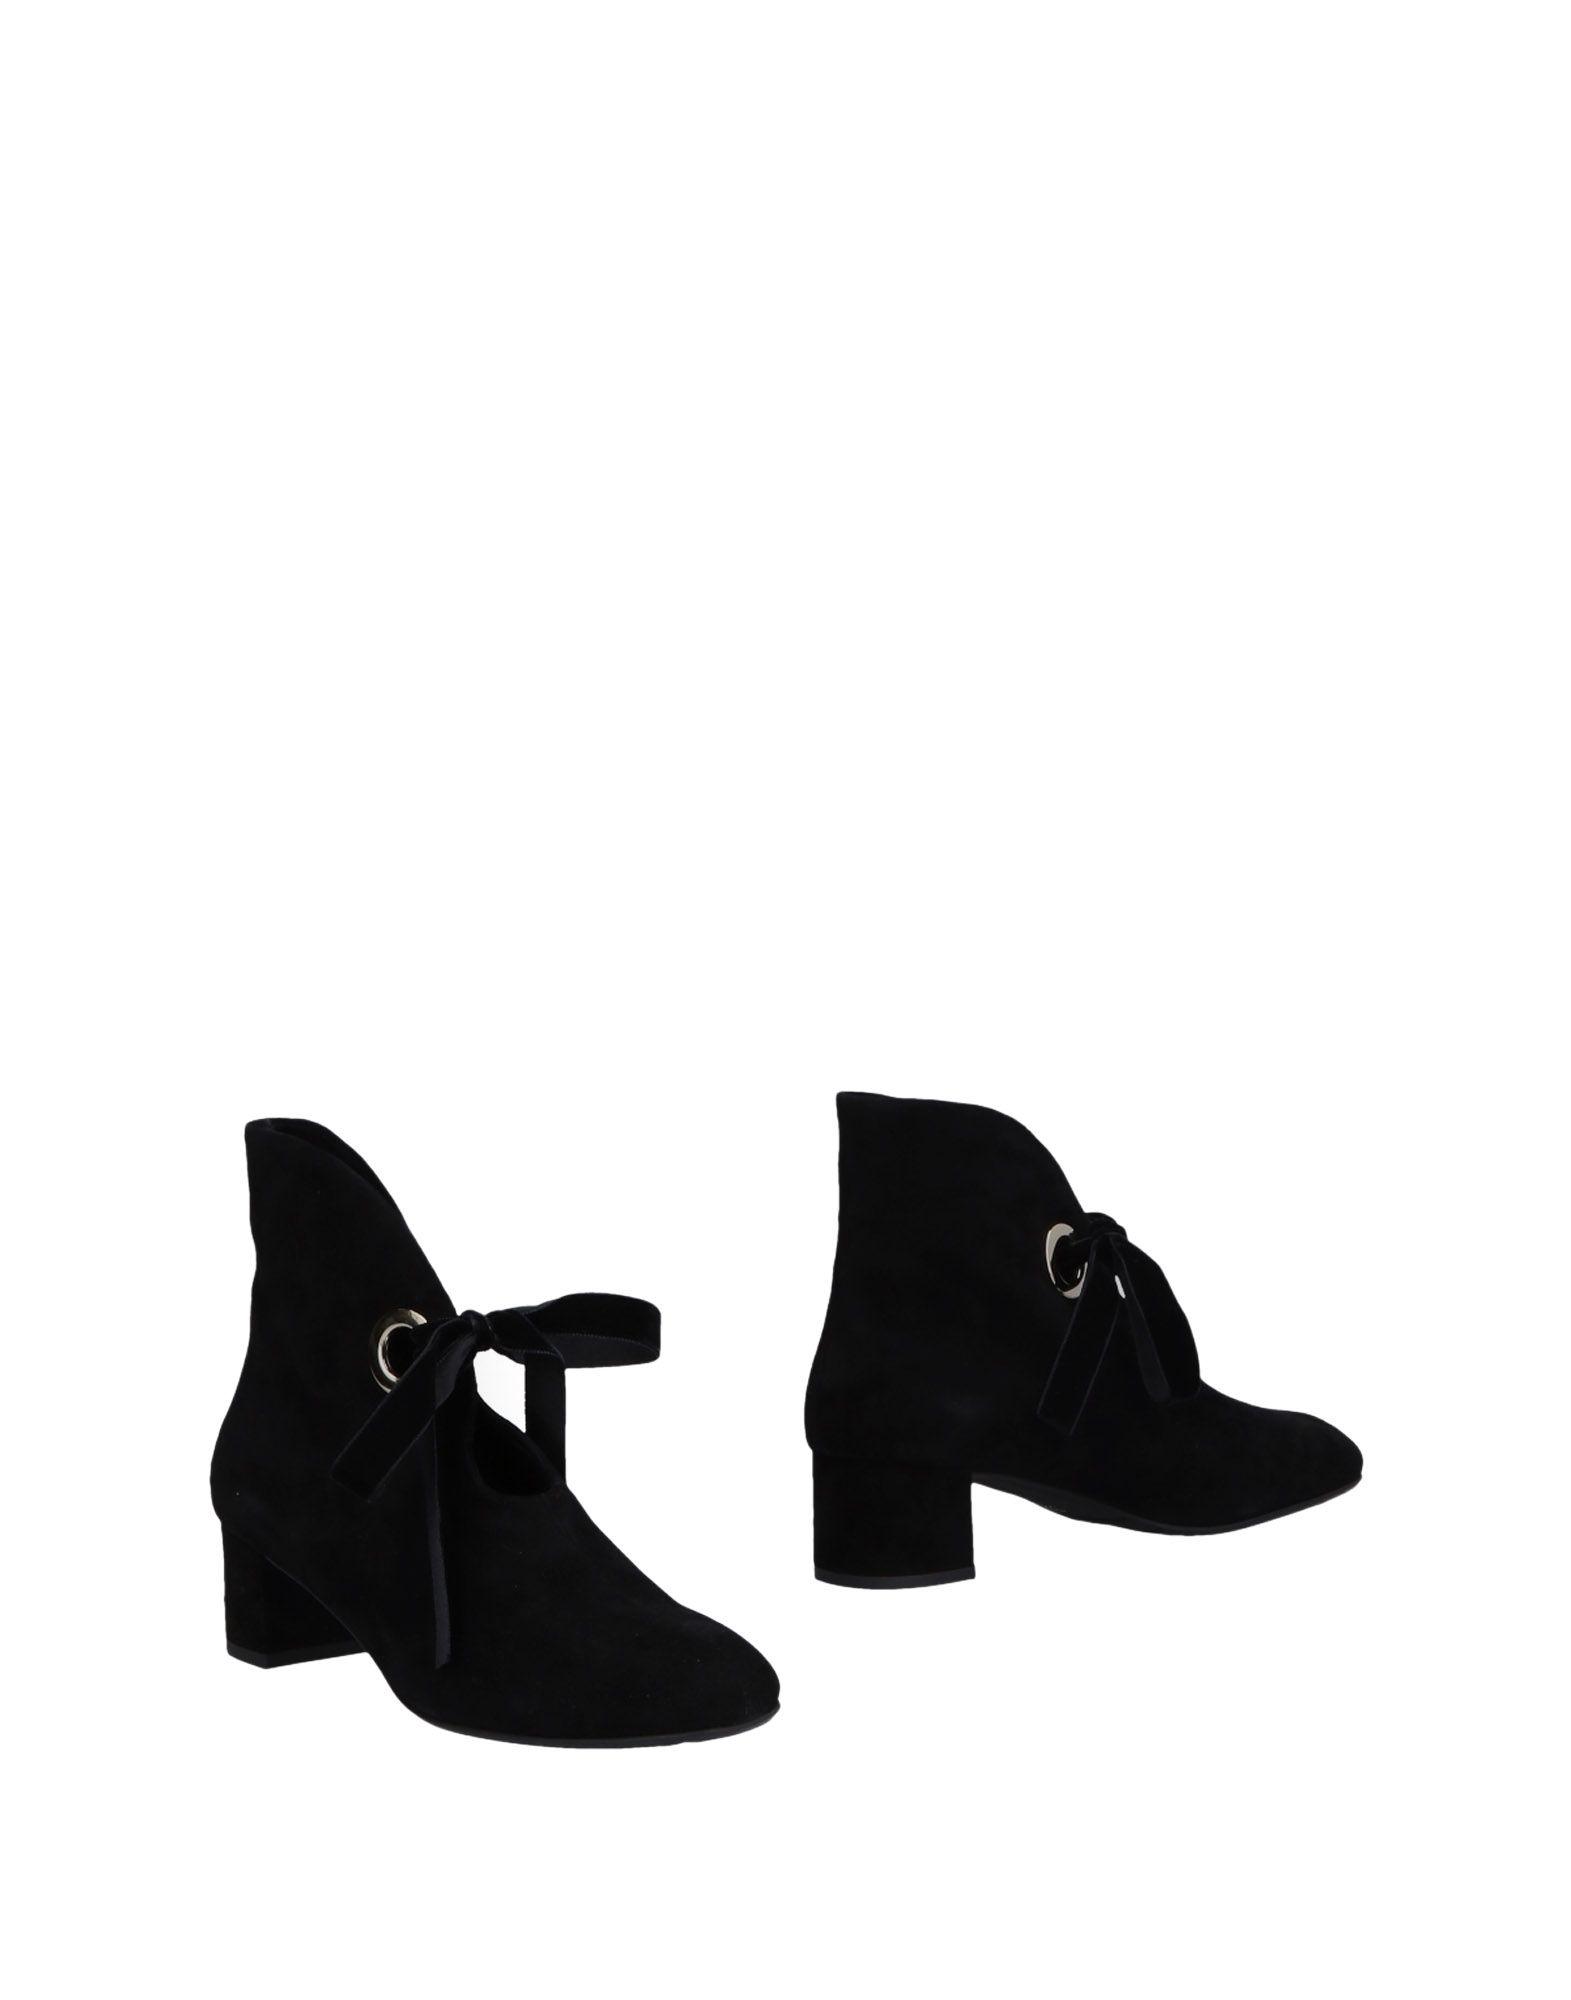 La Corte Della Pelle Boot By Franco Ballin Ankle Boot Pelle - Women La Corte Della Pelle By Franco Ballin Ankle Boots online on  Canada - 11477475AN 304ef2